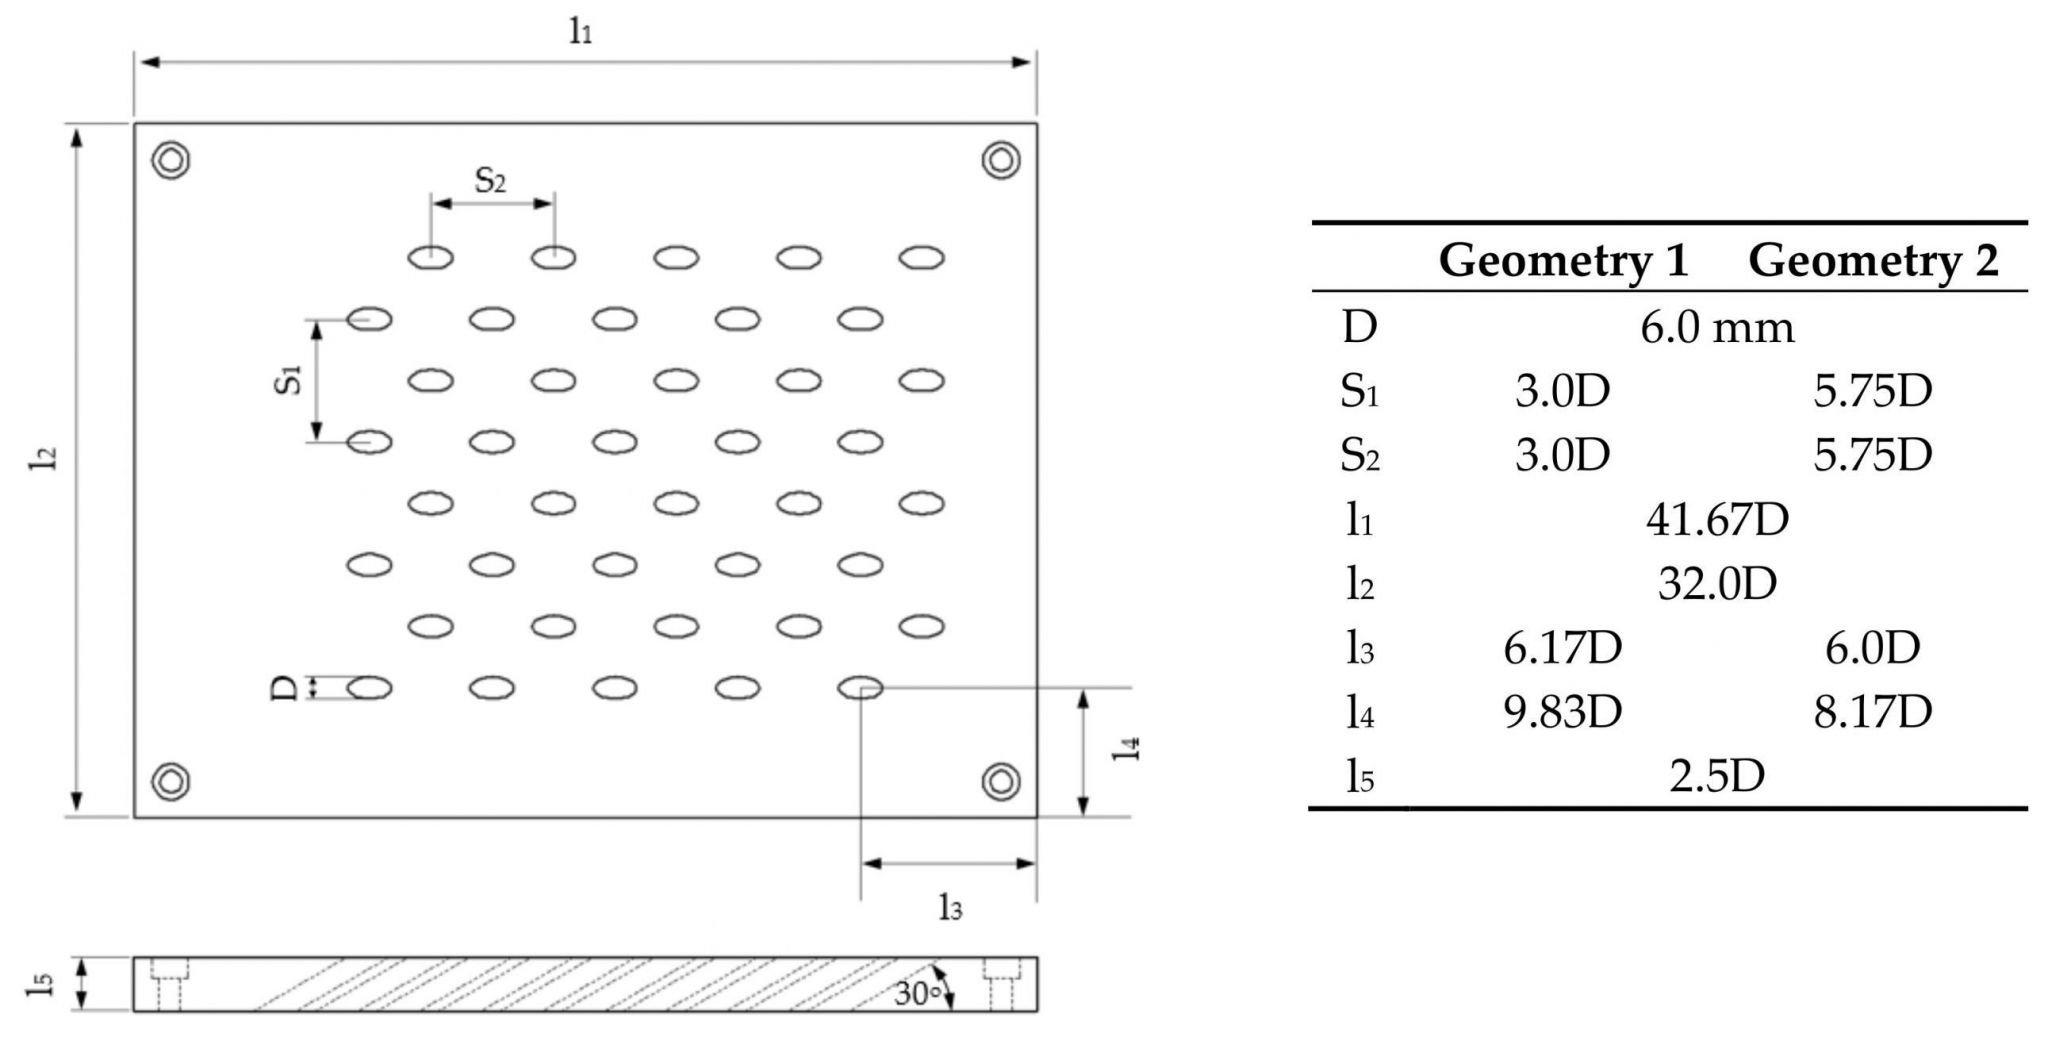 Fundamental Theorem Of Algebra Worksheet Answers  Briefencounters For Fundamental Theorem Of Algebra Worksheet Answers